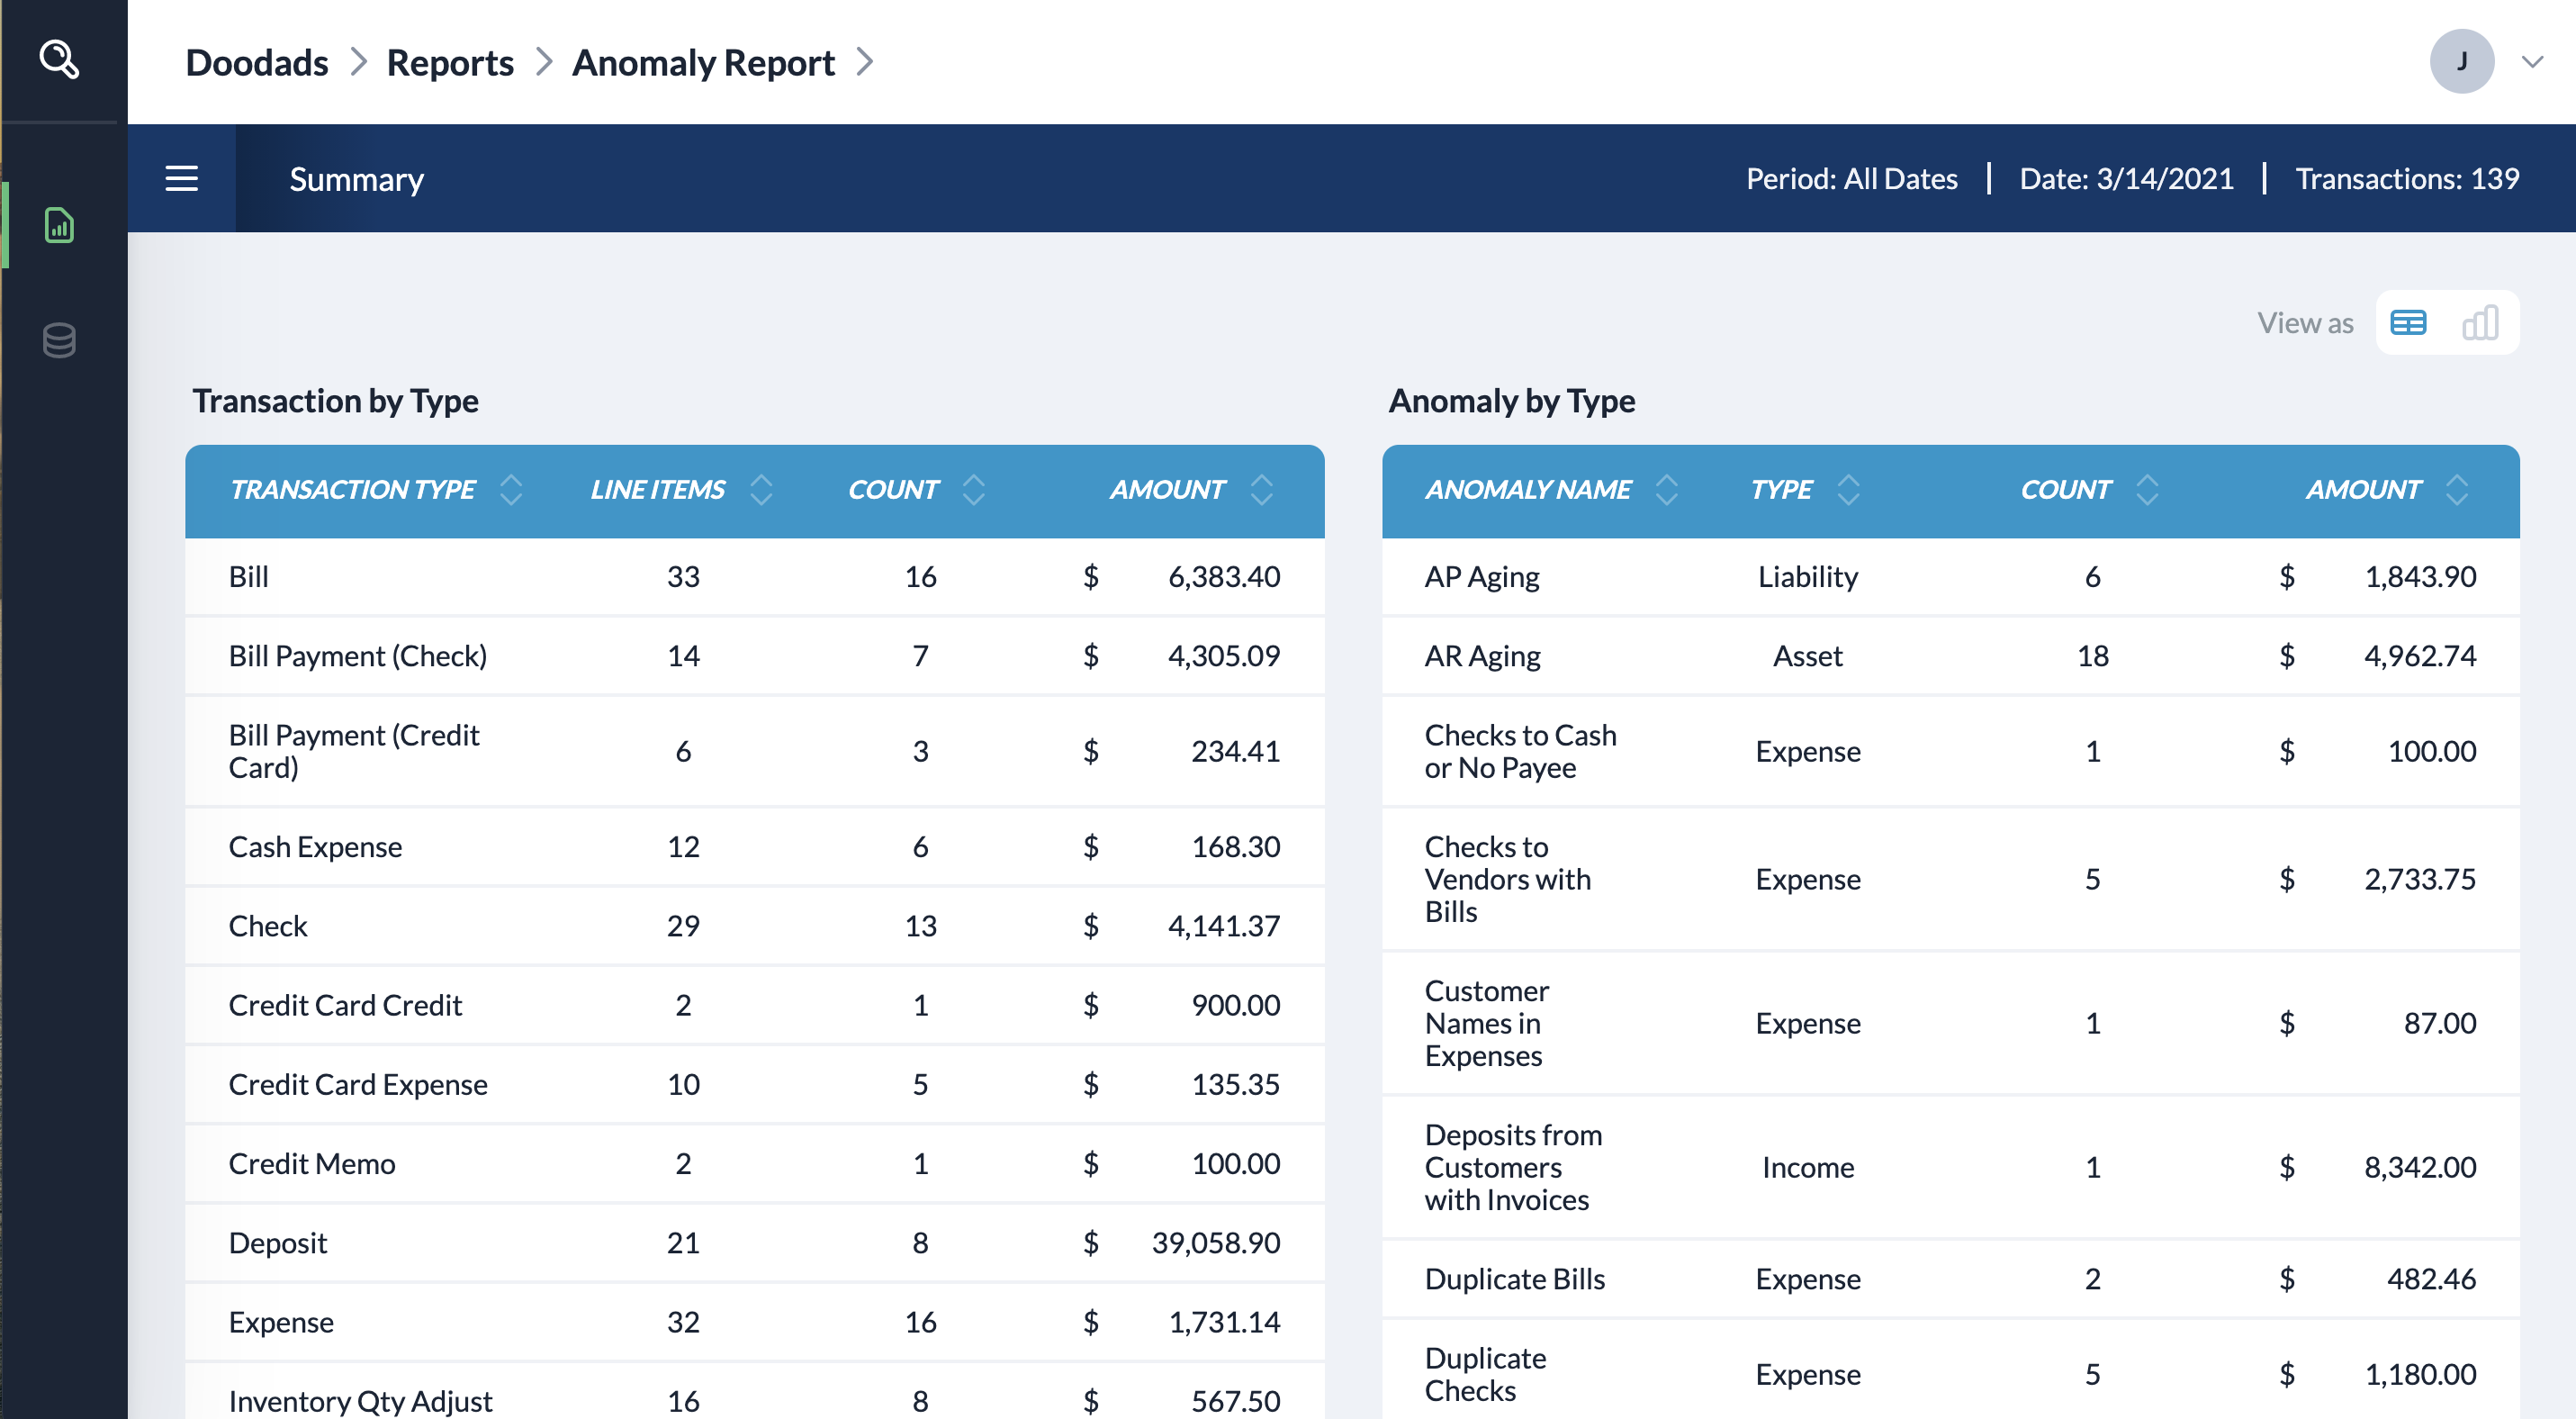 Scrutinize Report Summary Page